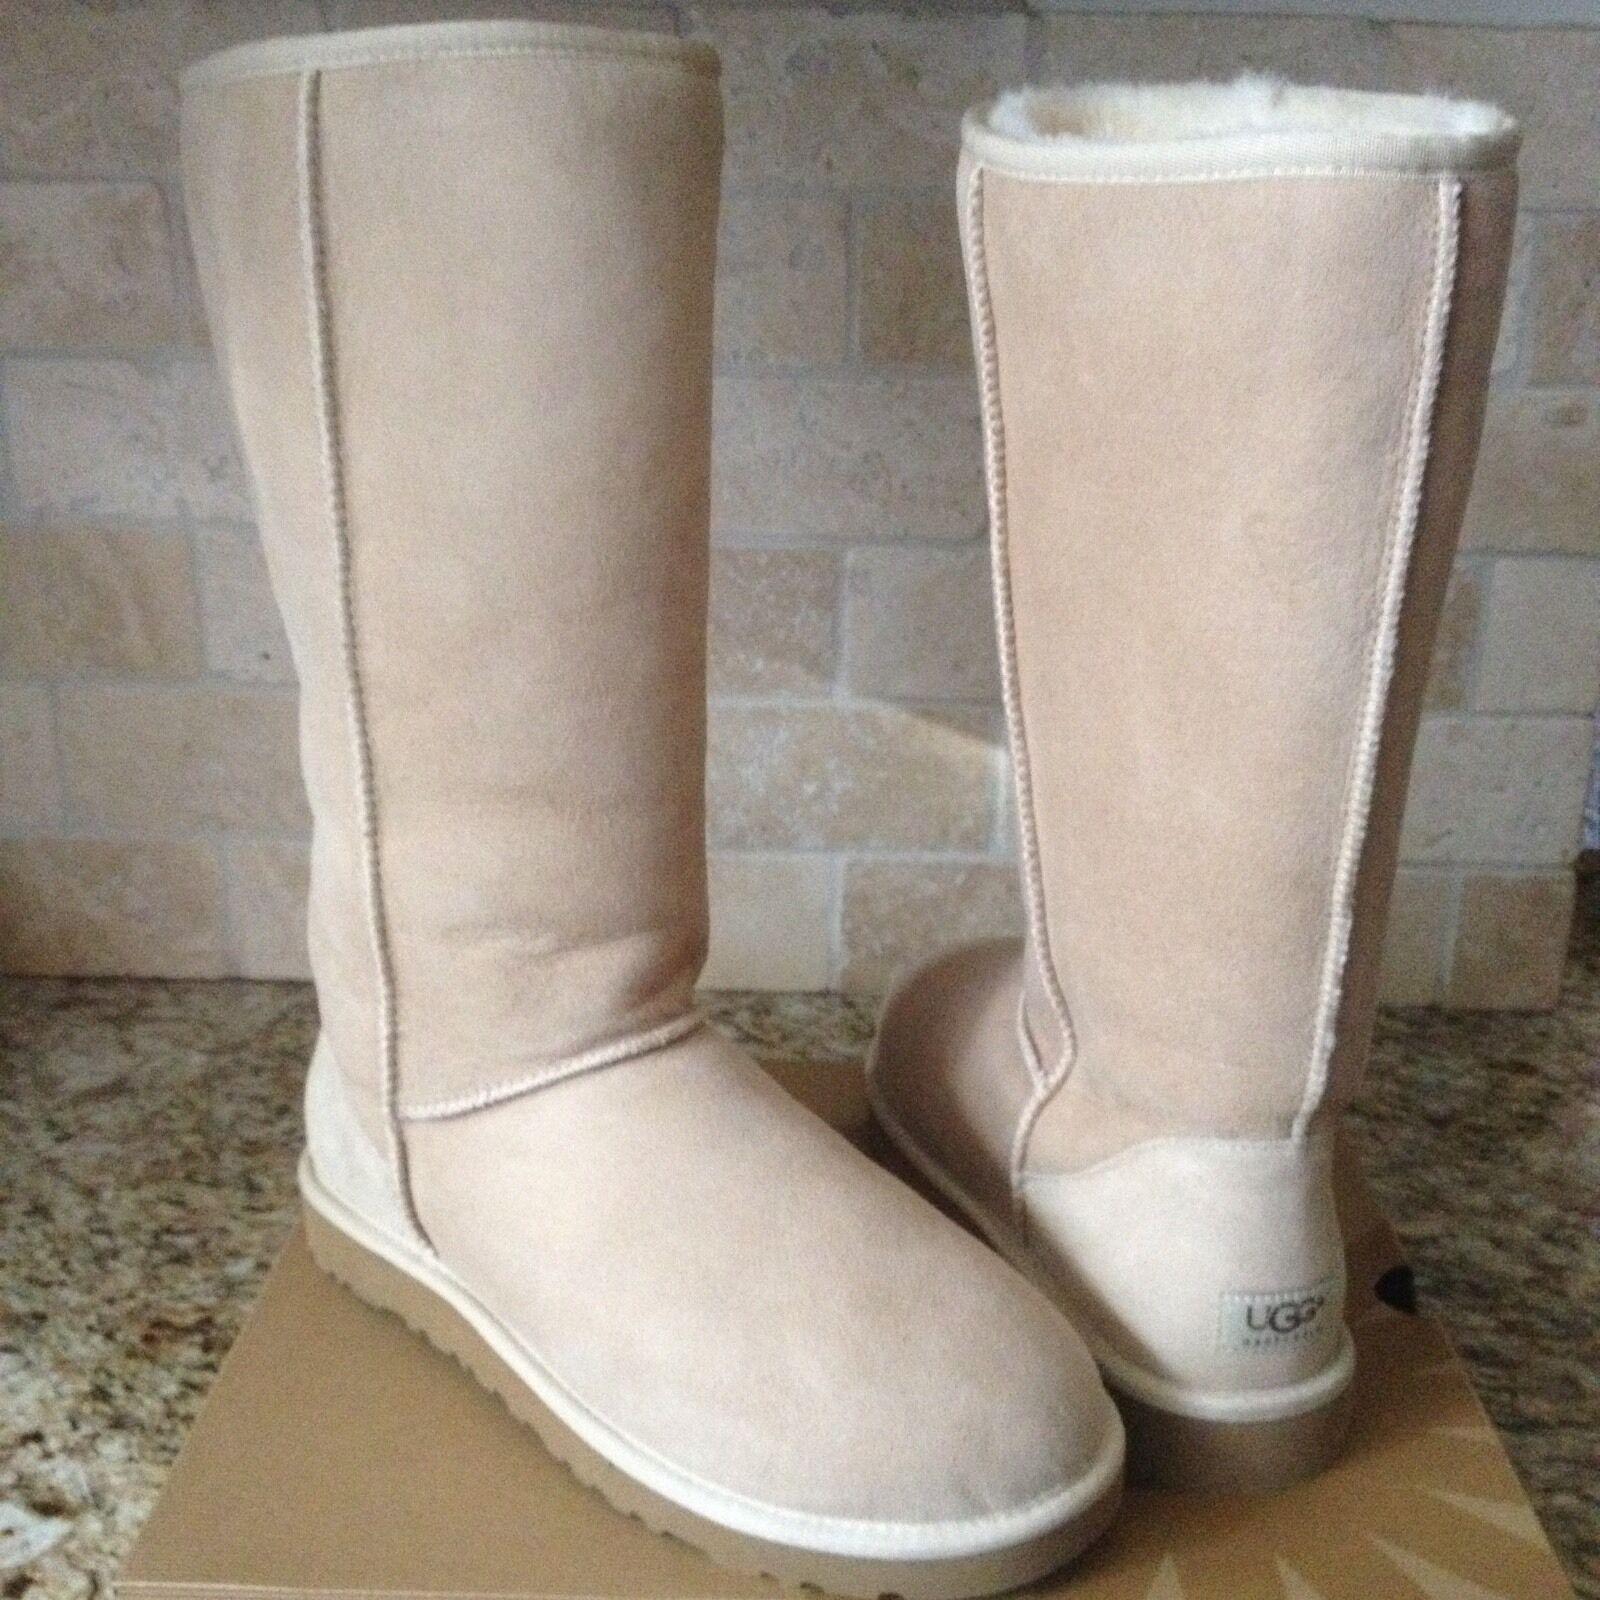 Botas de piel de oveja UGG Classic Tall Sand Beige Suede Tamaño US 10 para mujer NUEVO